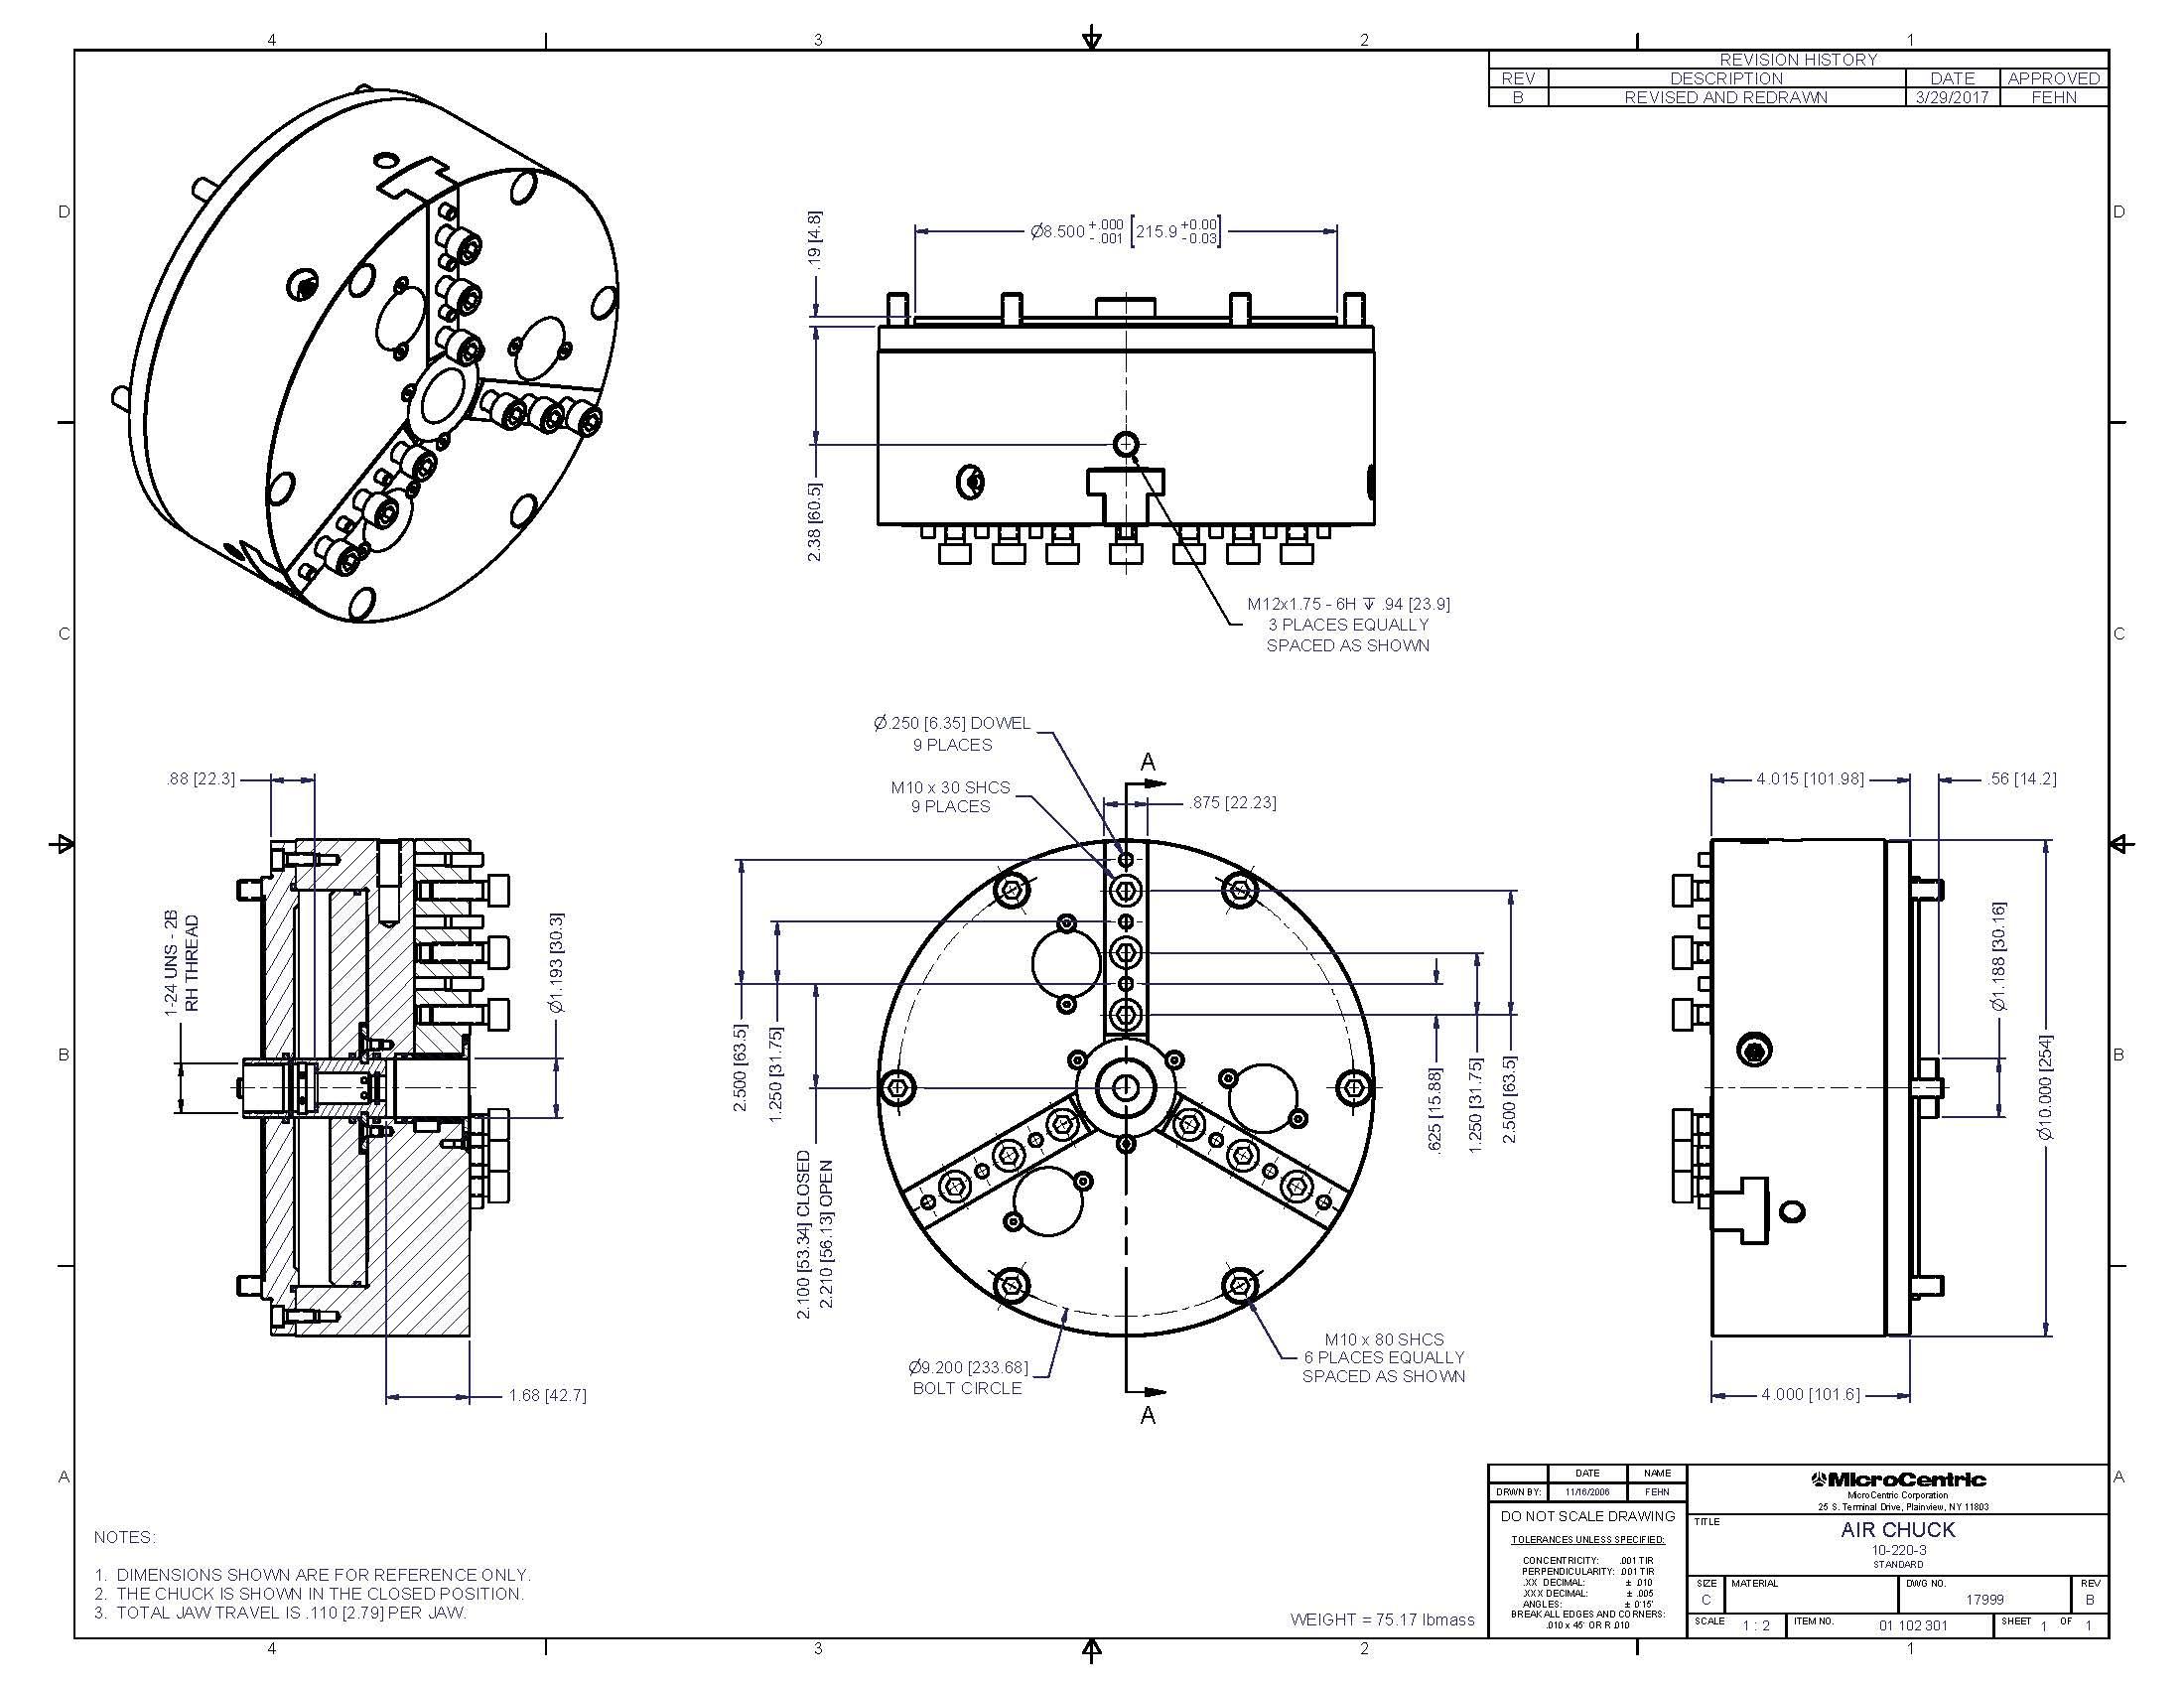 Model 10-220-3, Rotating Air Chucks On MicroCentric Corp.